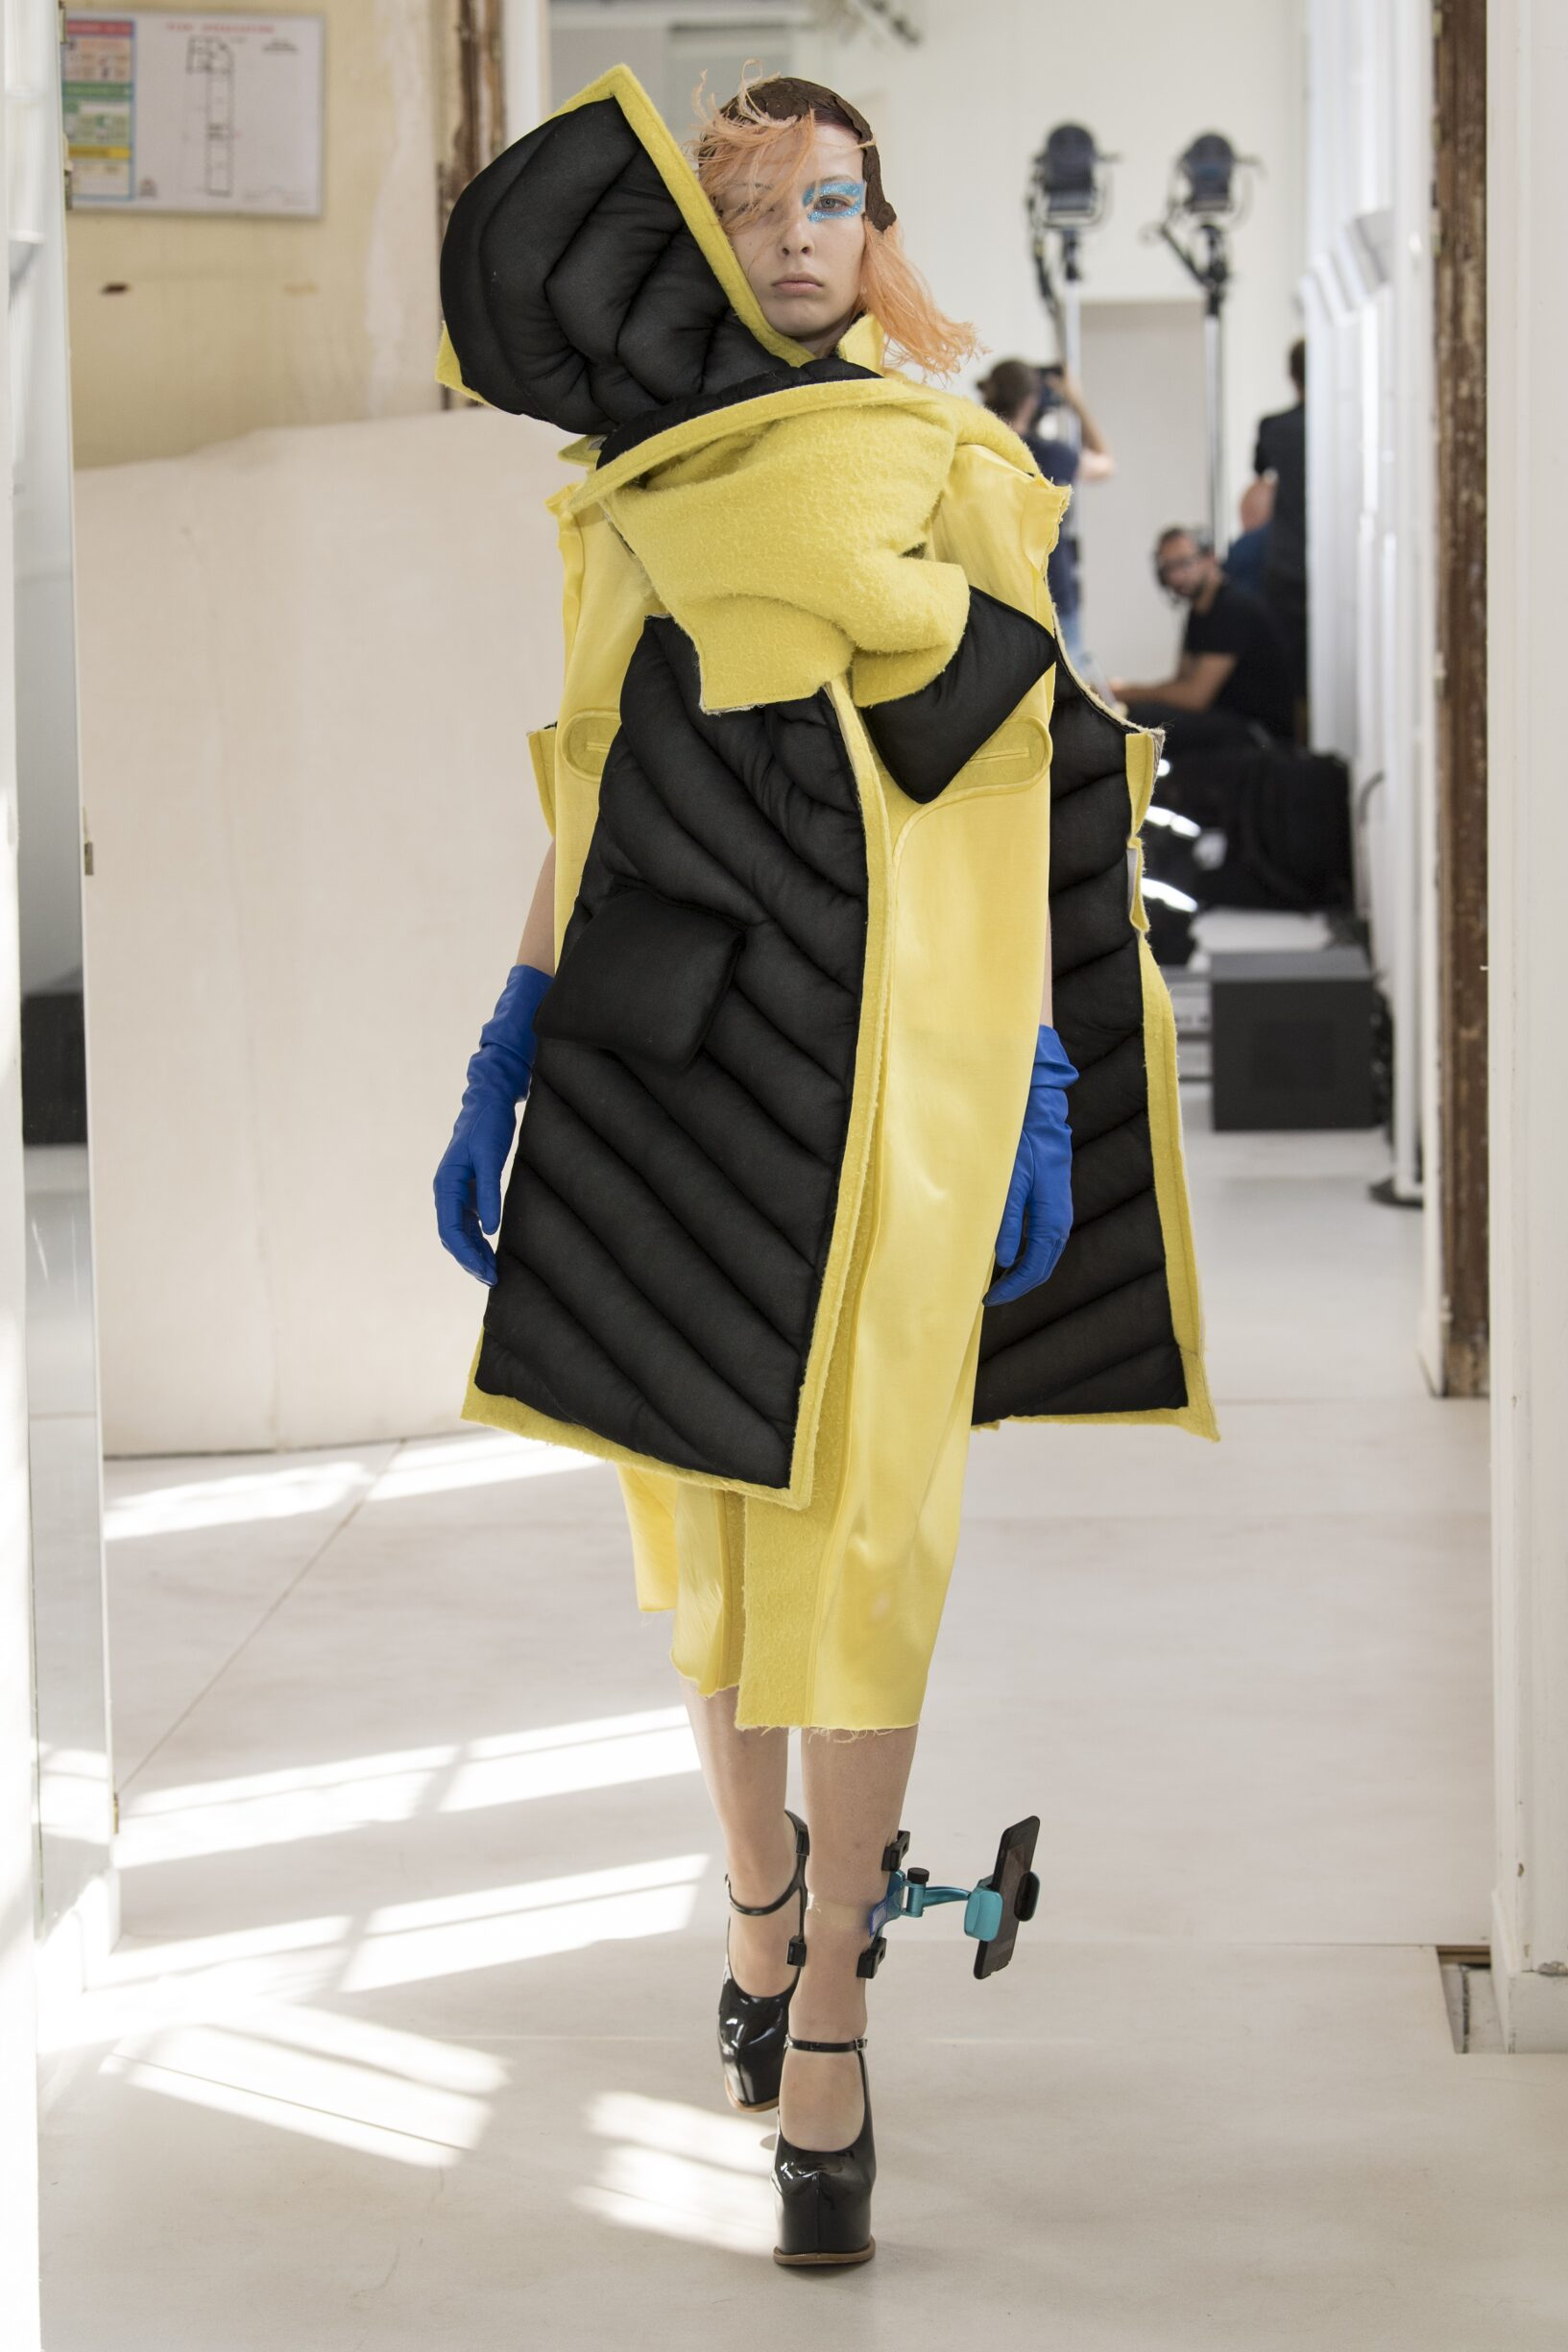 FW 2018 19 Maison Margiela Artisanal Fashion Show